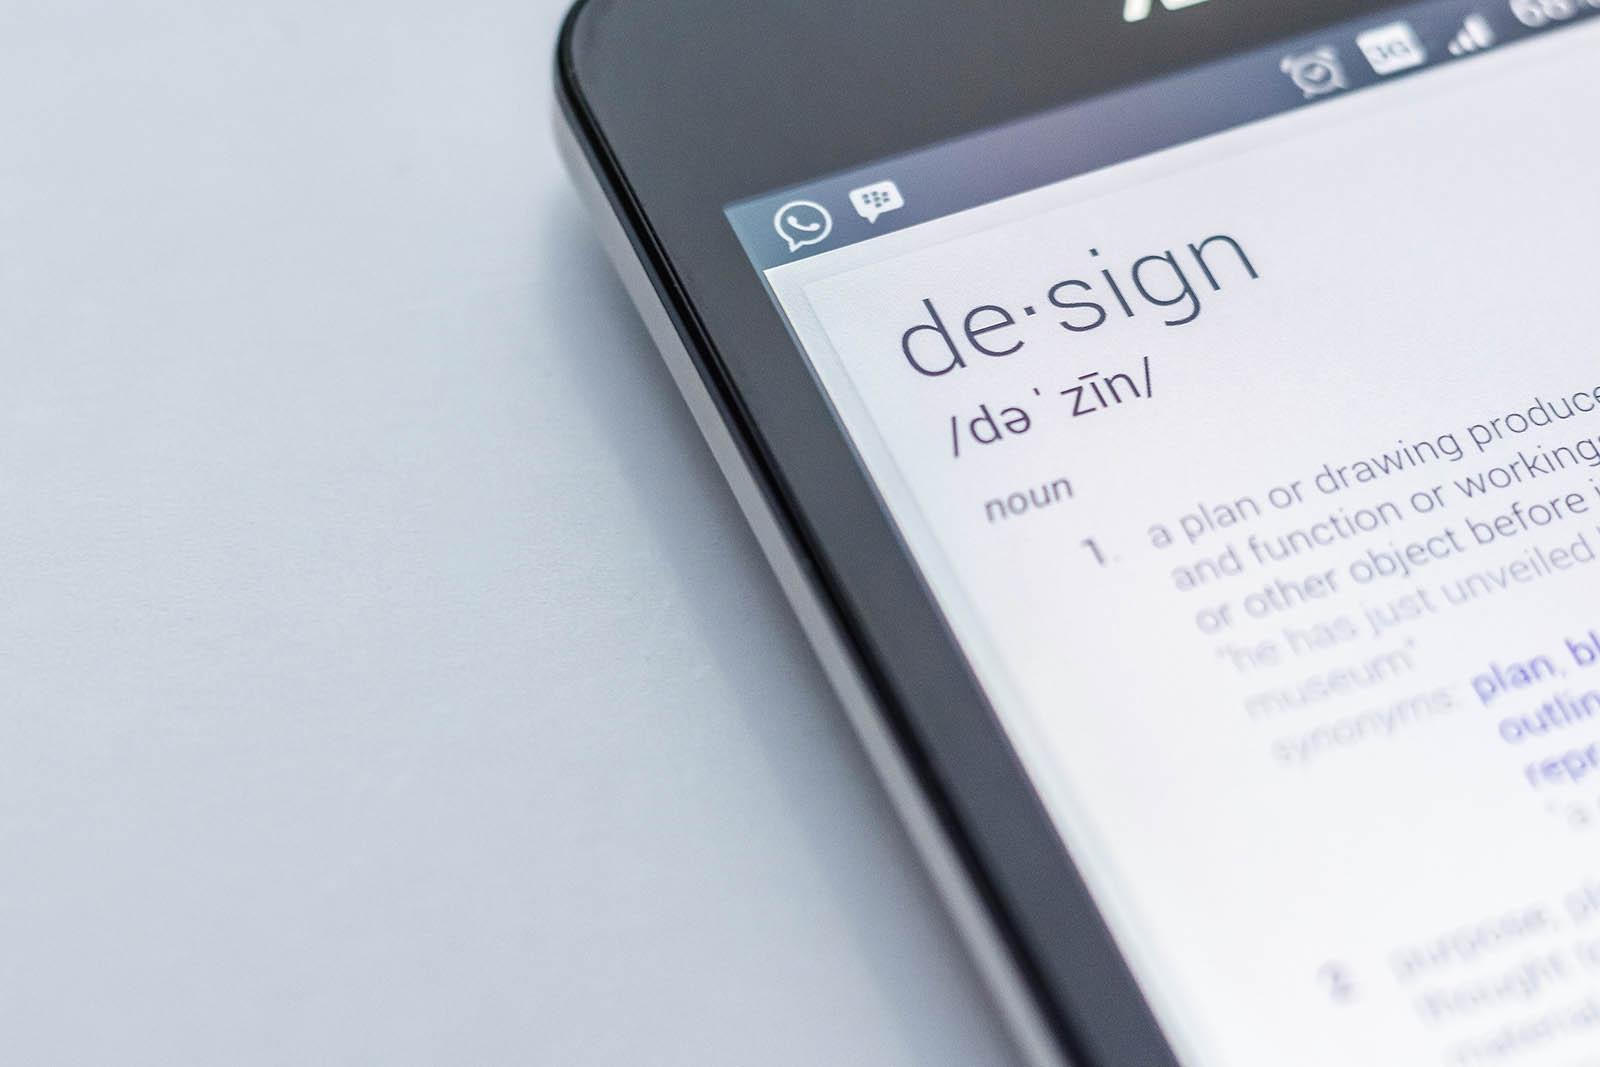 Comparison between UI Design, UX Design and Interface Design